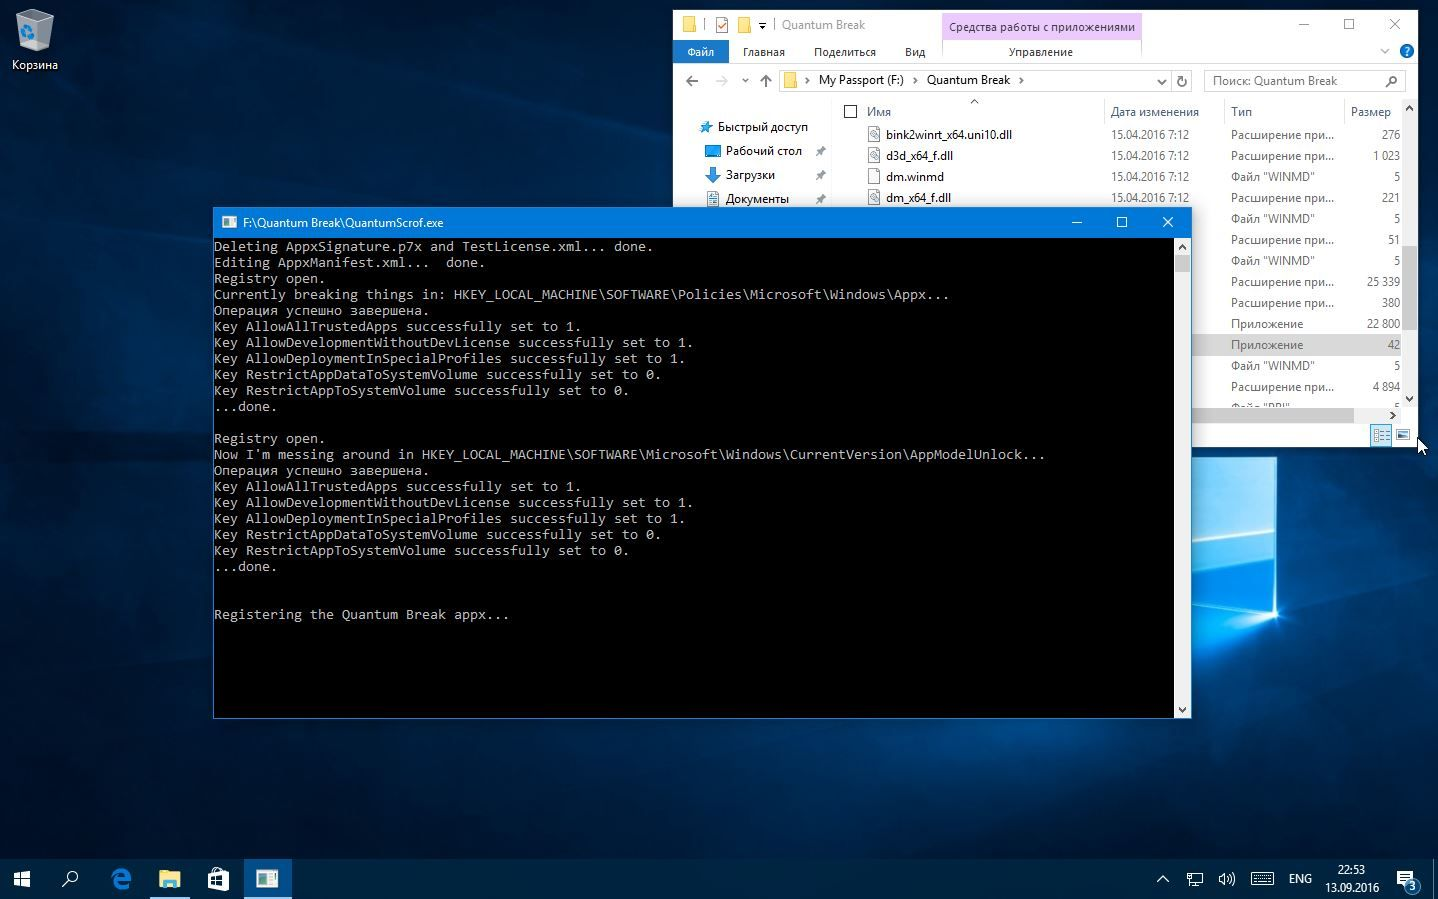 windows 10 pro 1709 x64 torrent